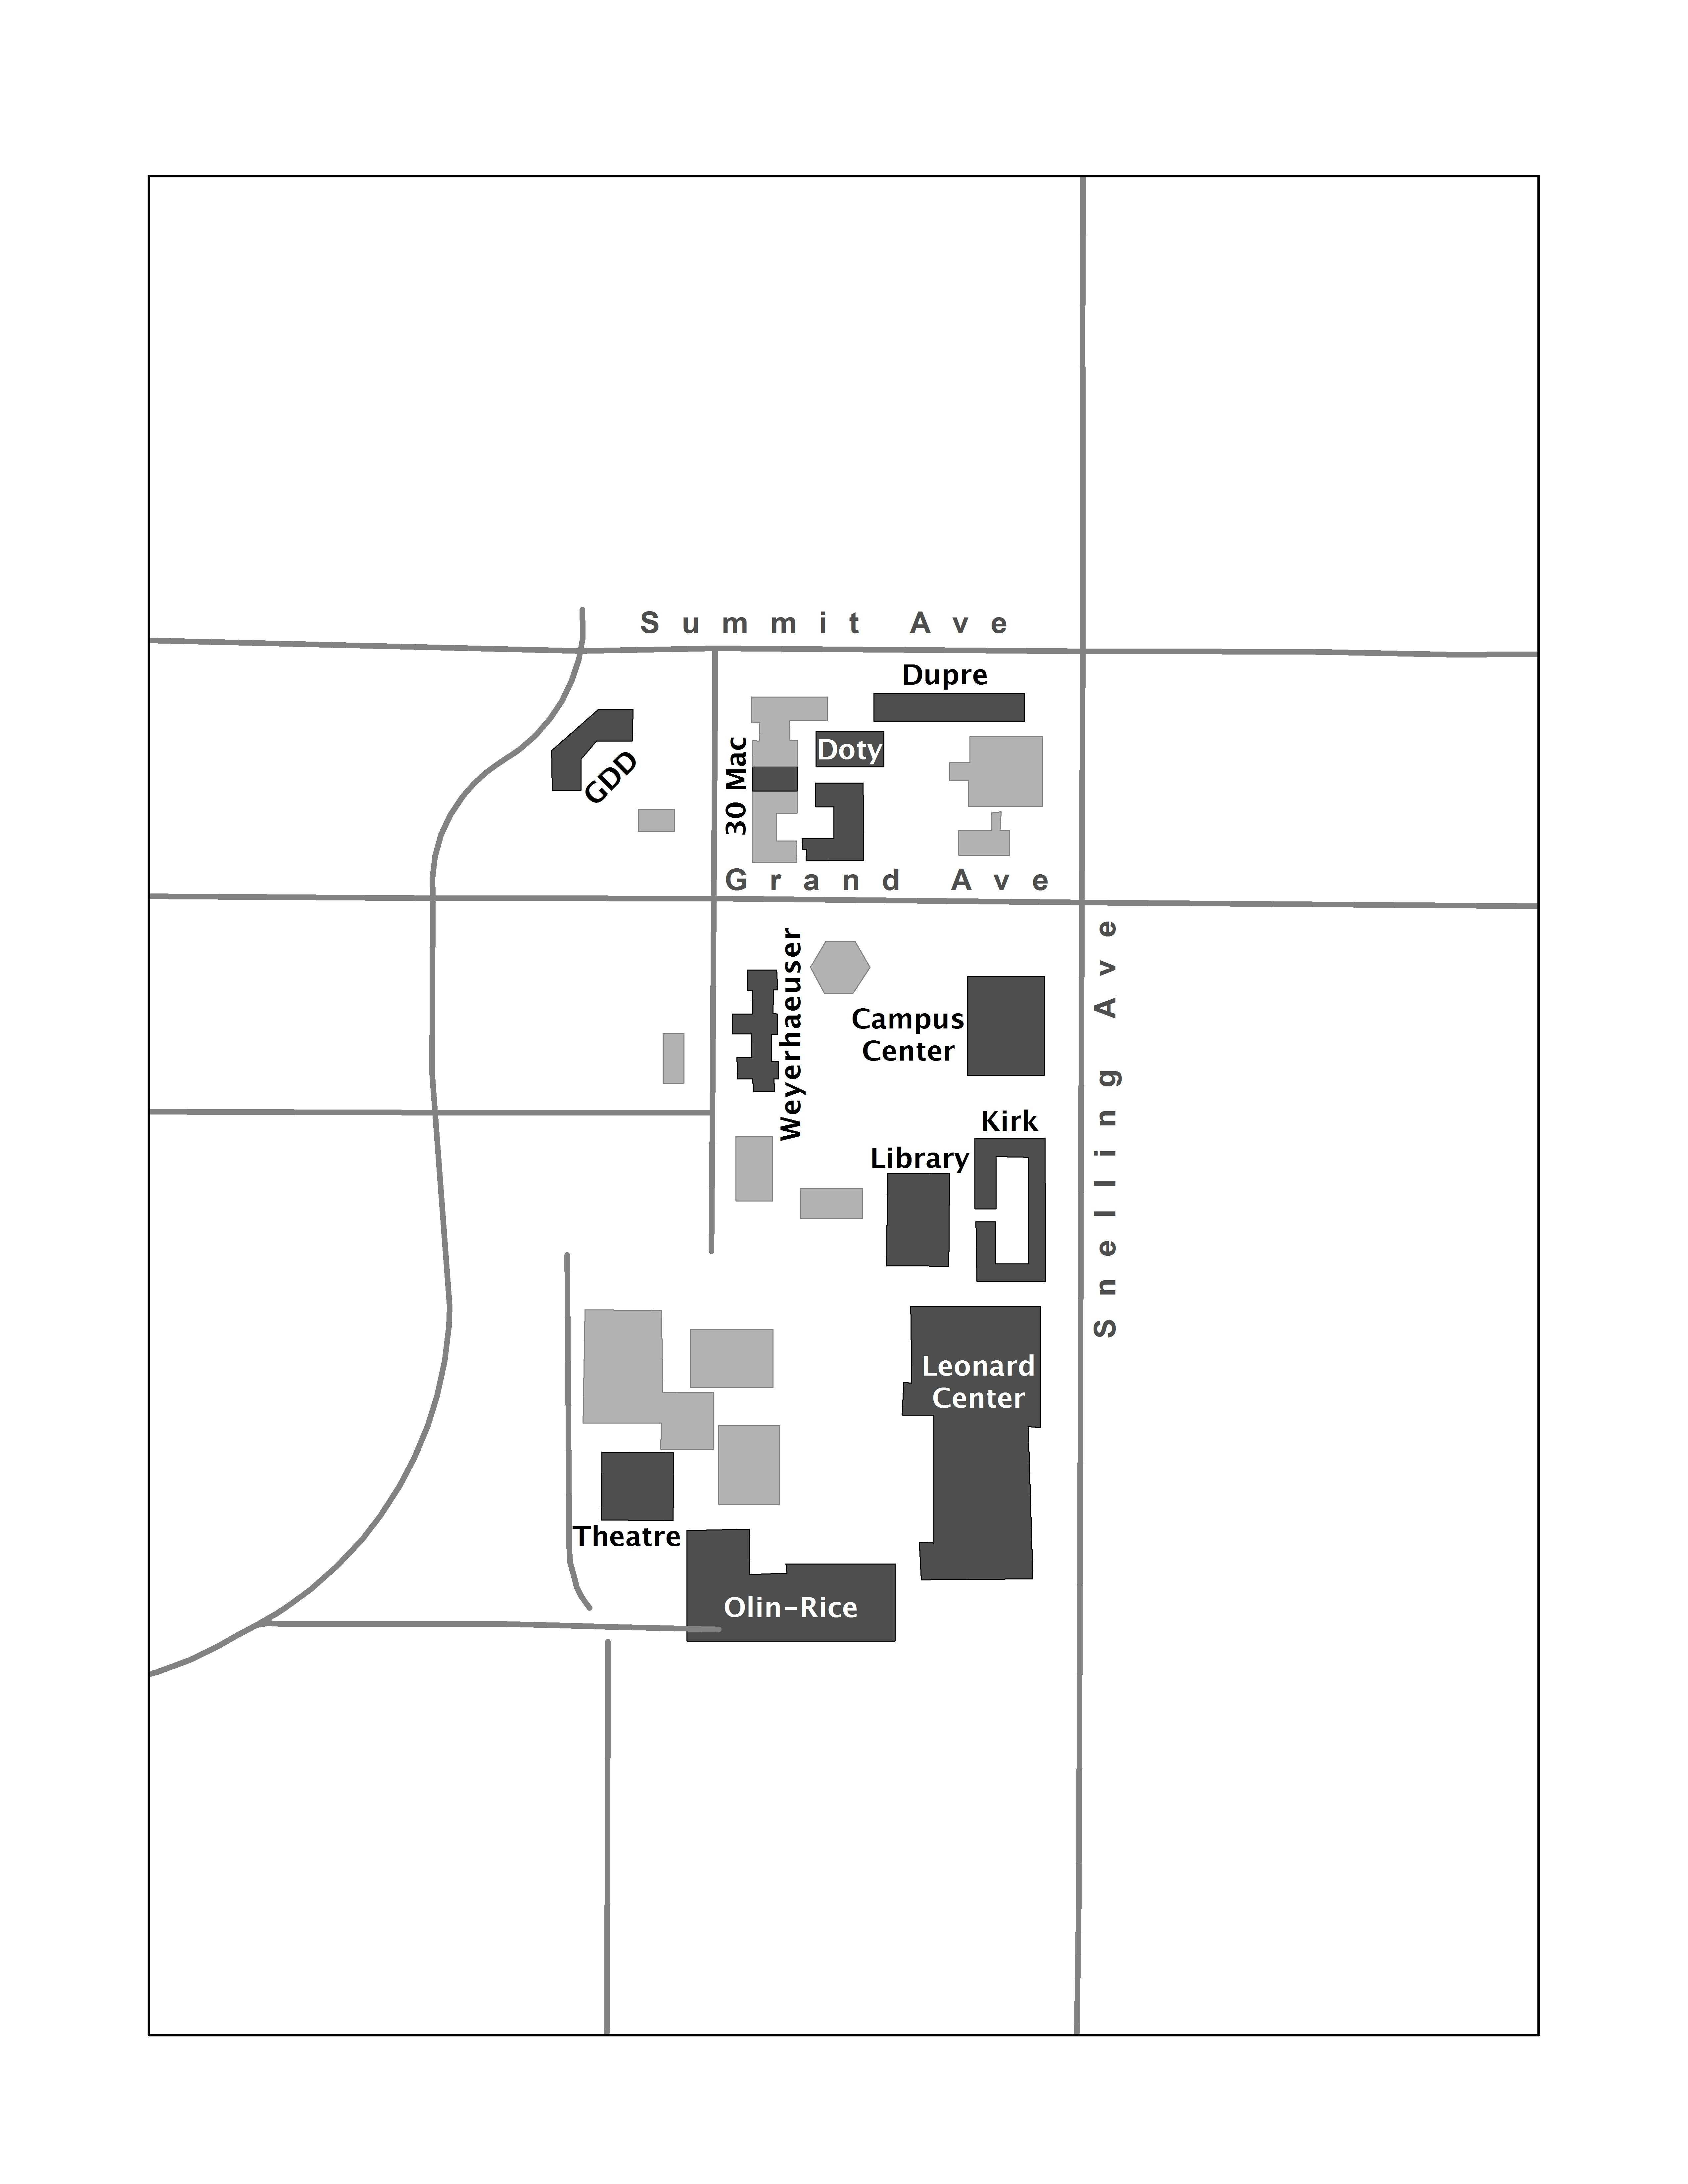 Map by Alex Bentz '14. Source: US Census